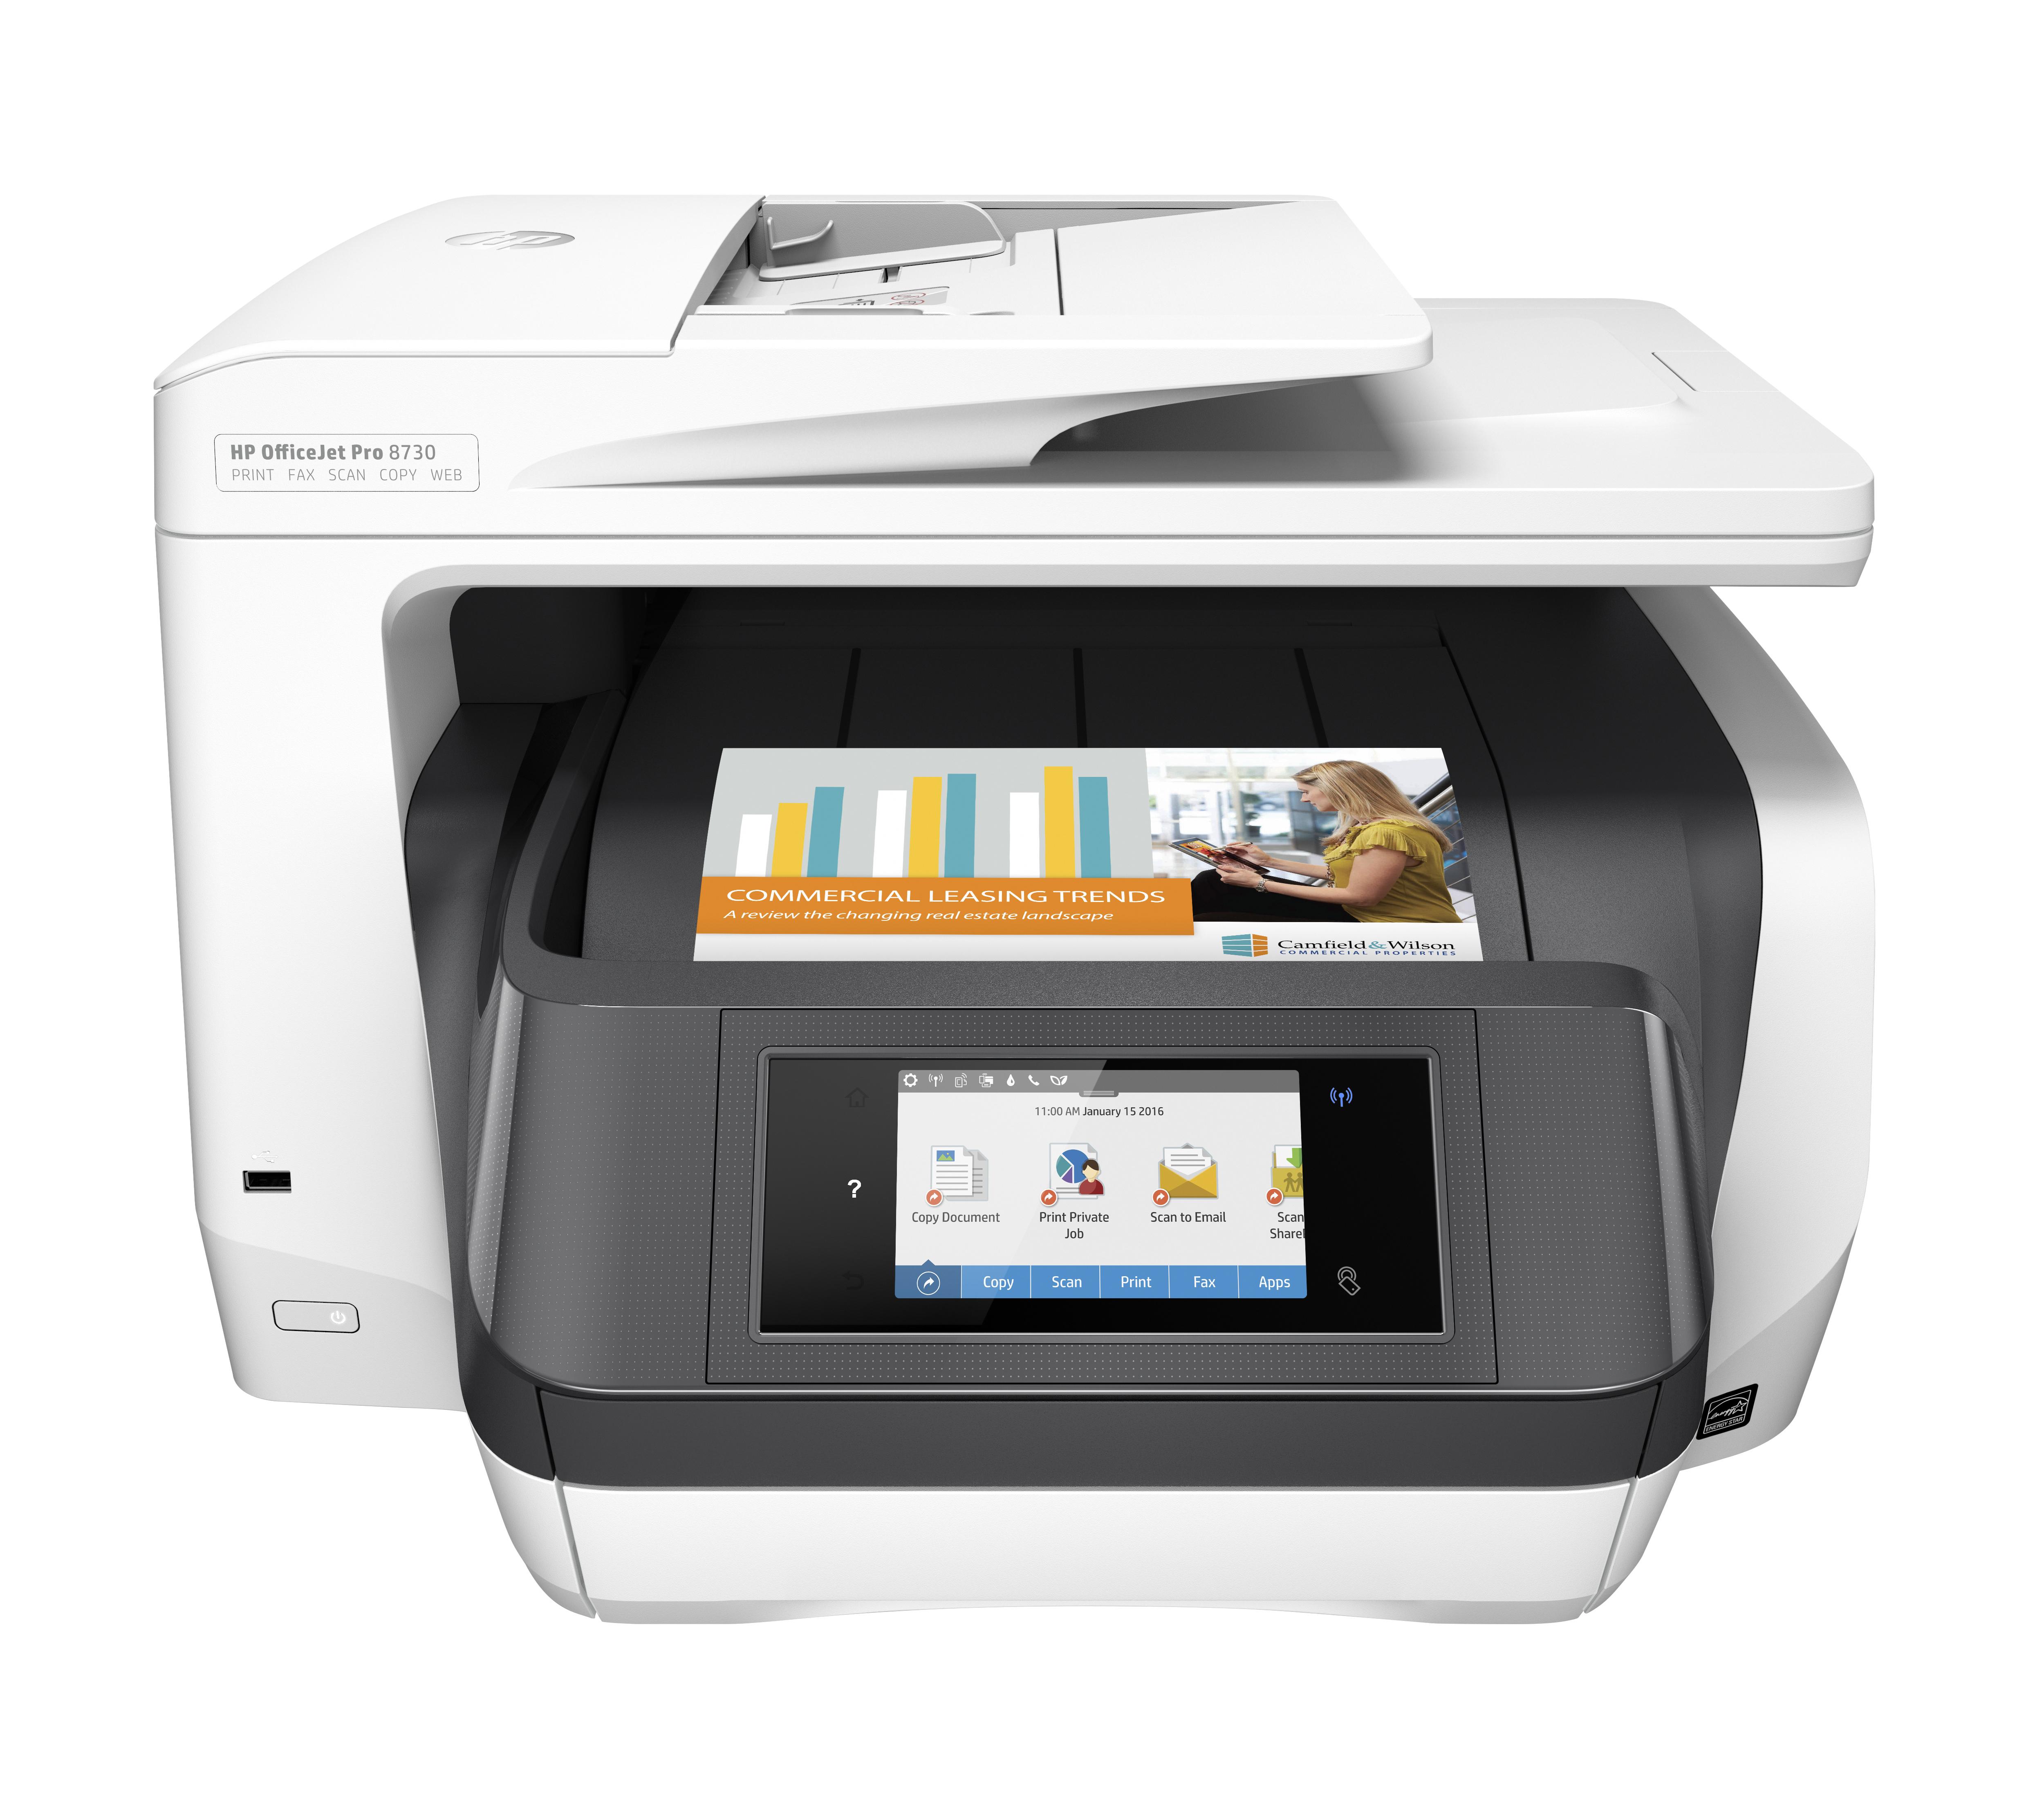 Officejet Pro 8730 (24 ppm, 1200 dpi, A4)